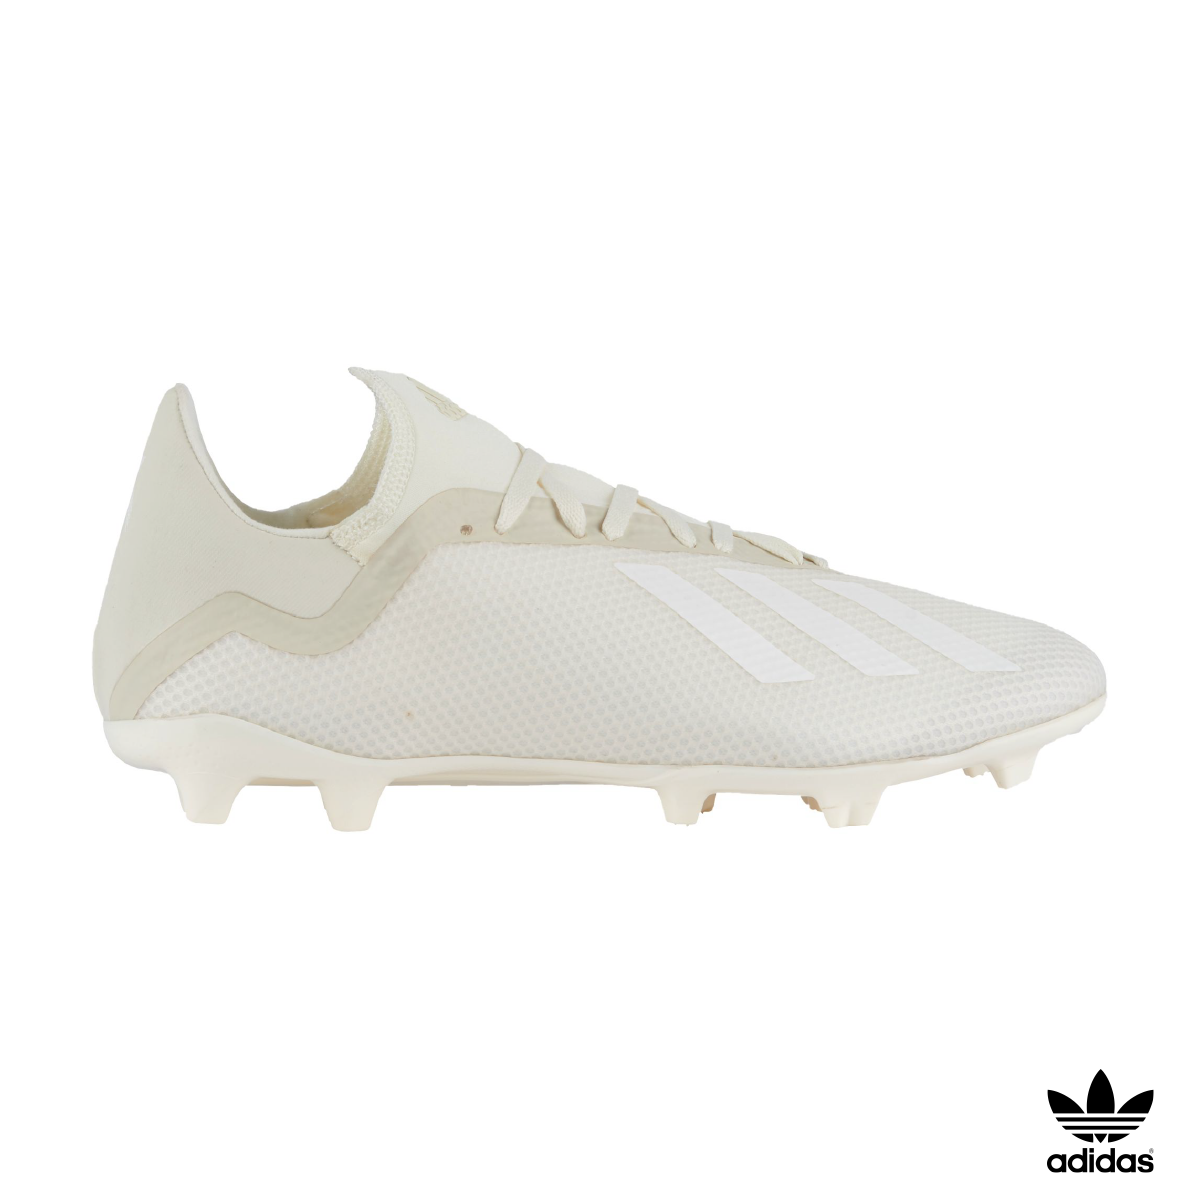 Adidas X 18.3 FG The Sport Shop EC